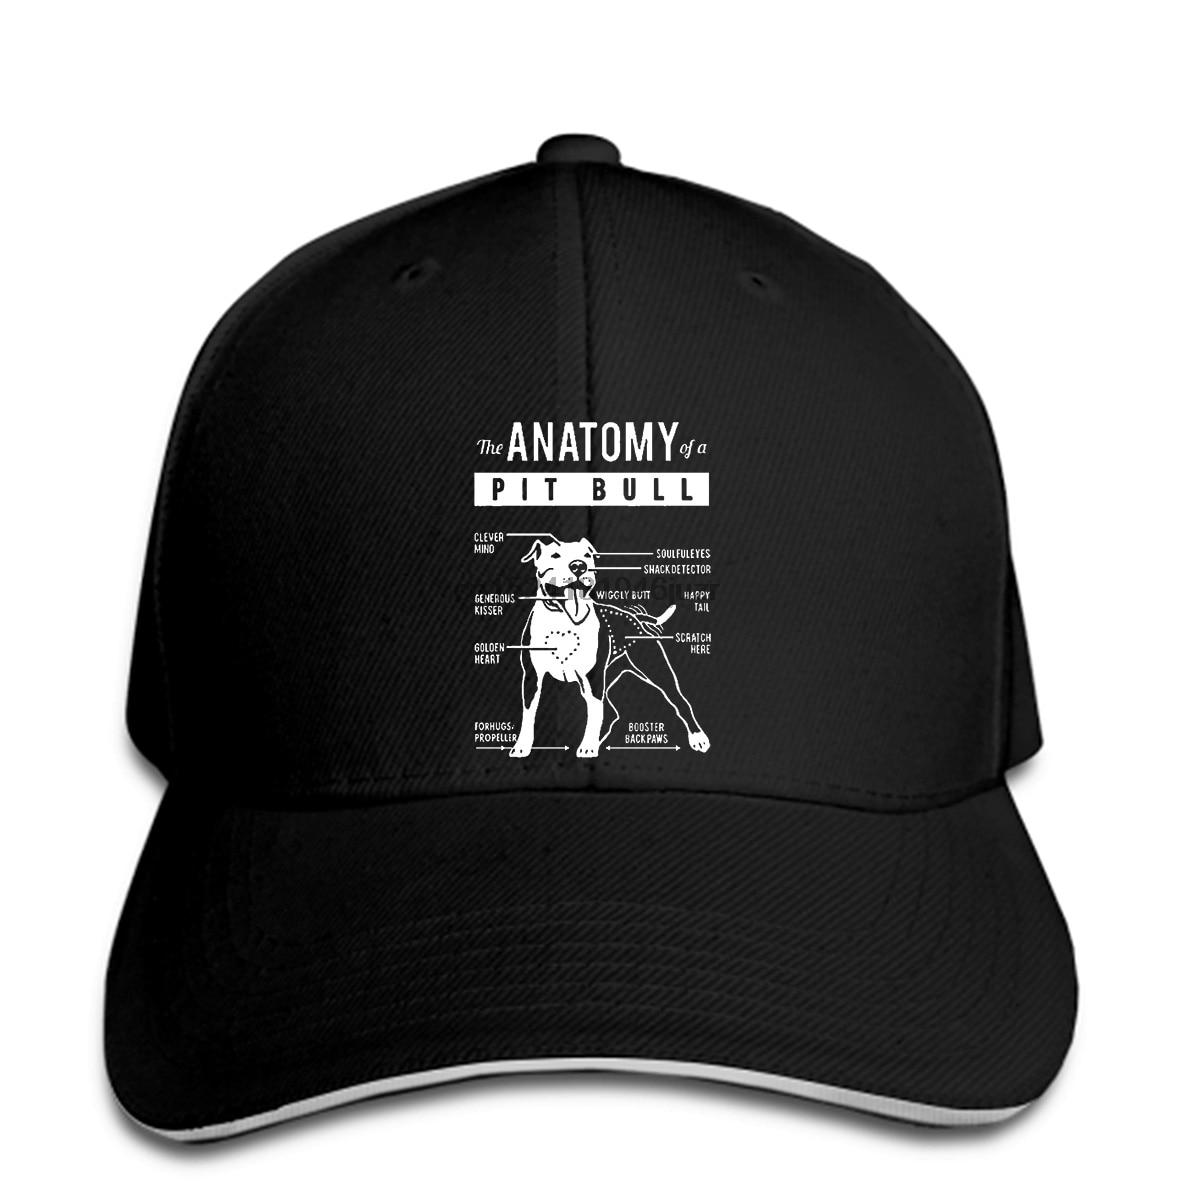 Hip Hop Baseball Caps Fashion Design Free Shipping The Anatomy